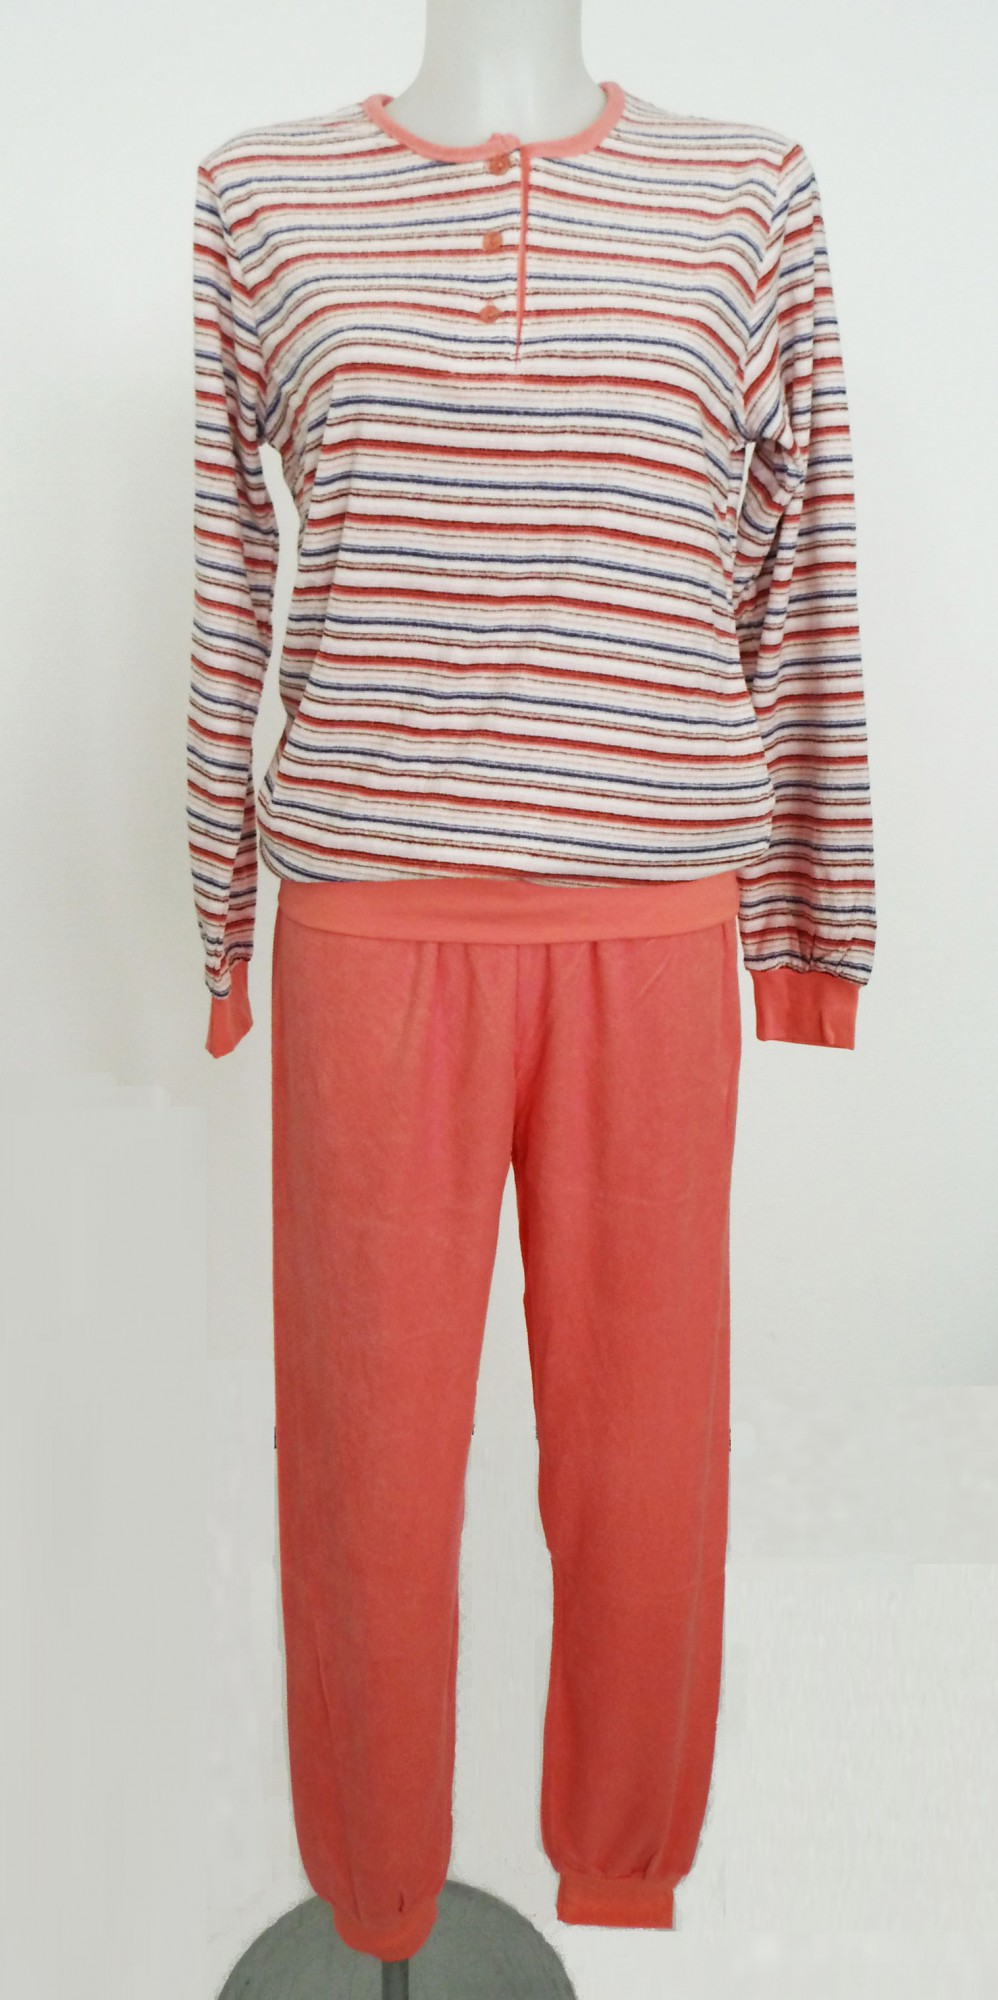 damen frottee pyjama lang mit b ndchen schlafanzug 201 93 856. Black Bedroom Furniture Sets. Home Design Ideas